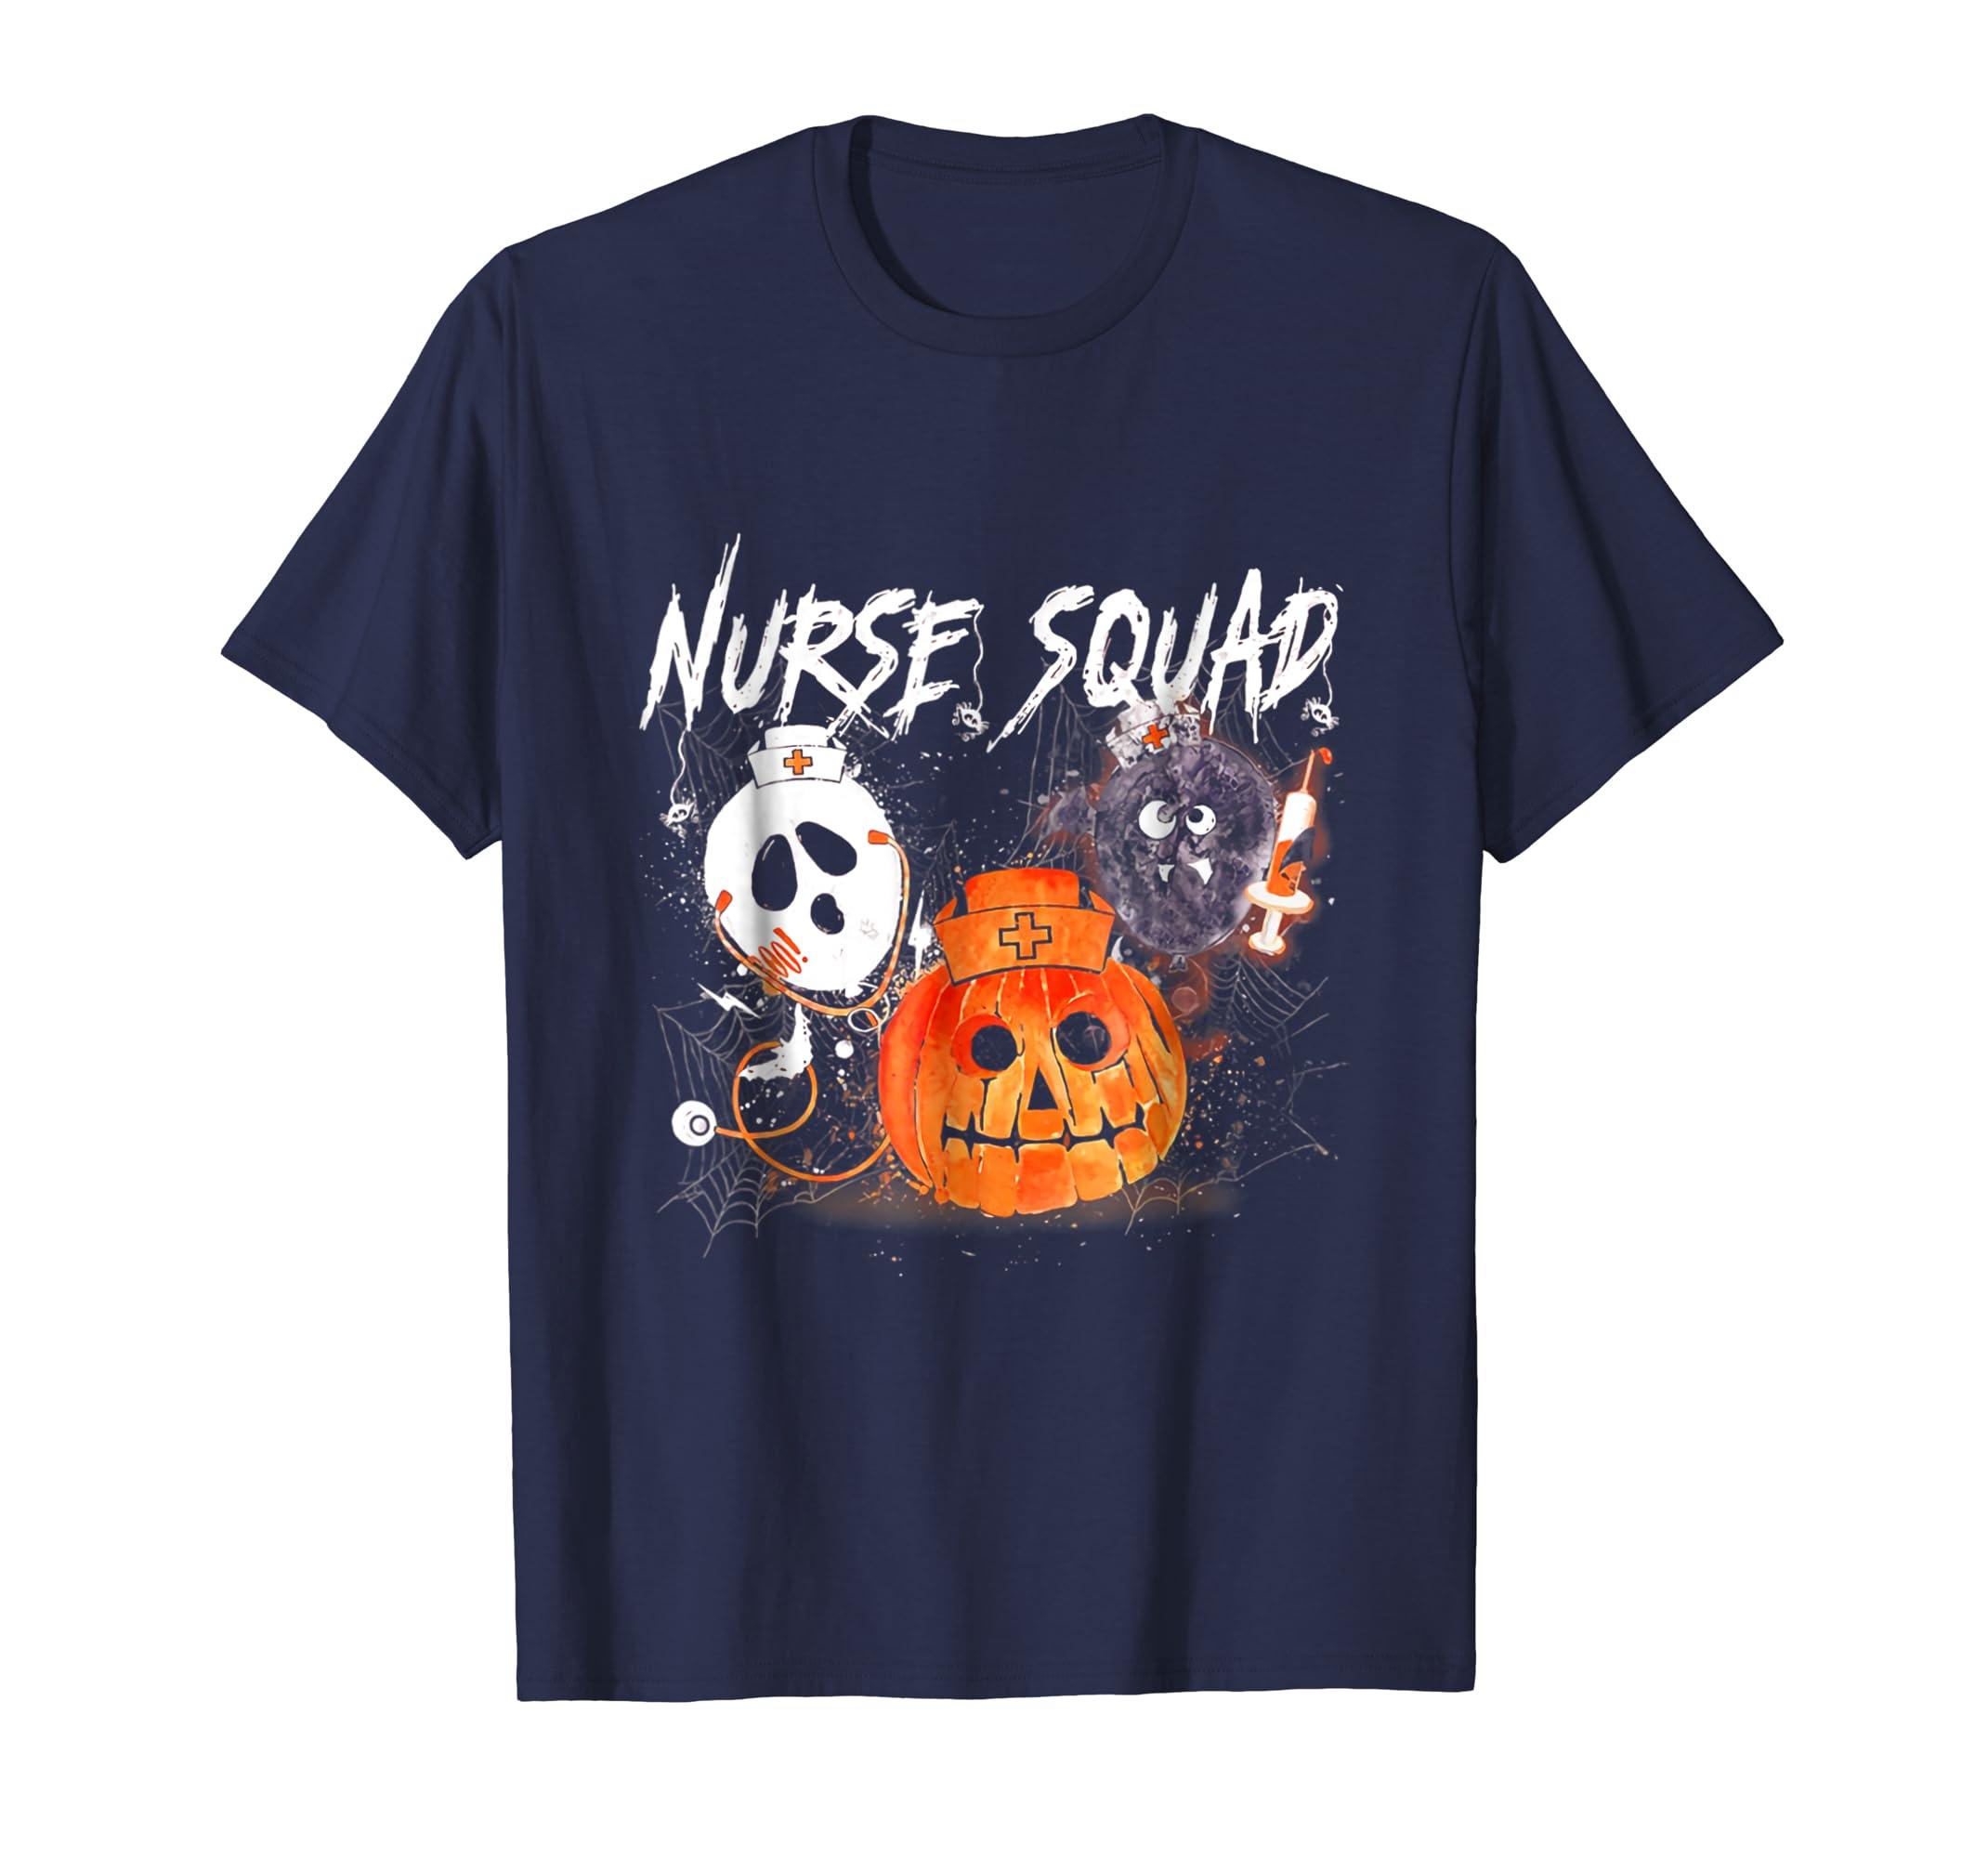 8c15445b4aa15 Nurse Squad Funny Halloween Pumpkin Costume T Shirt-Colonhue – Colonhue.com